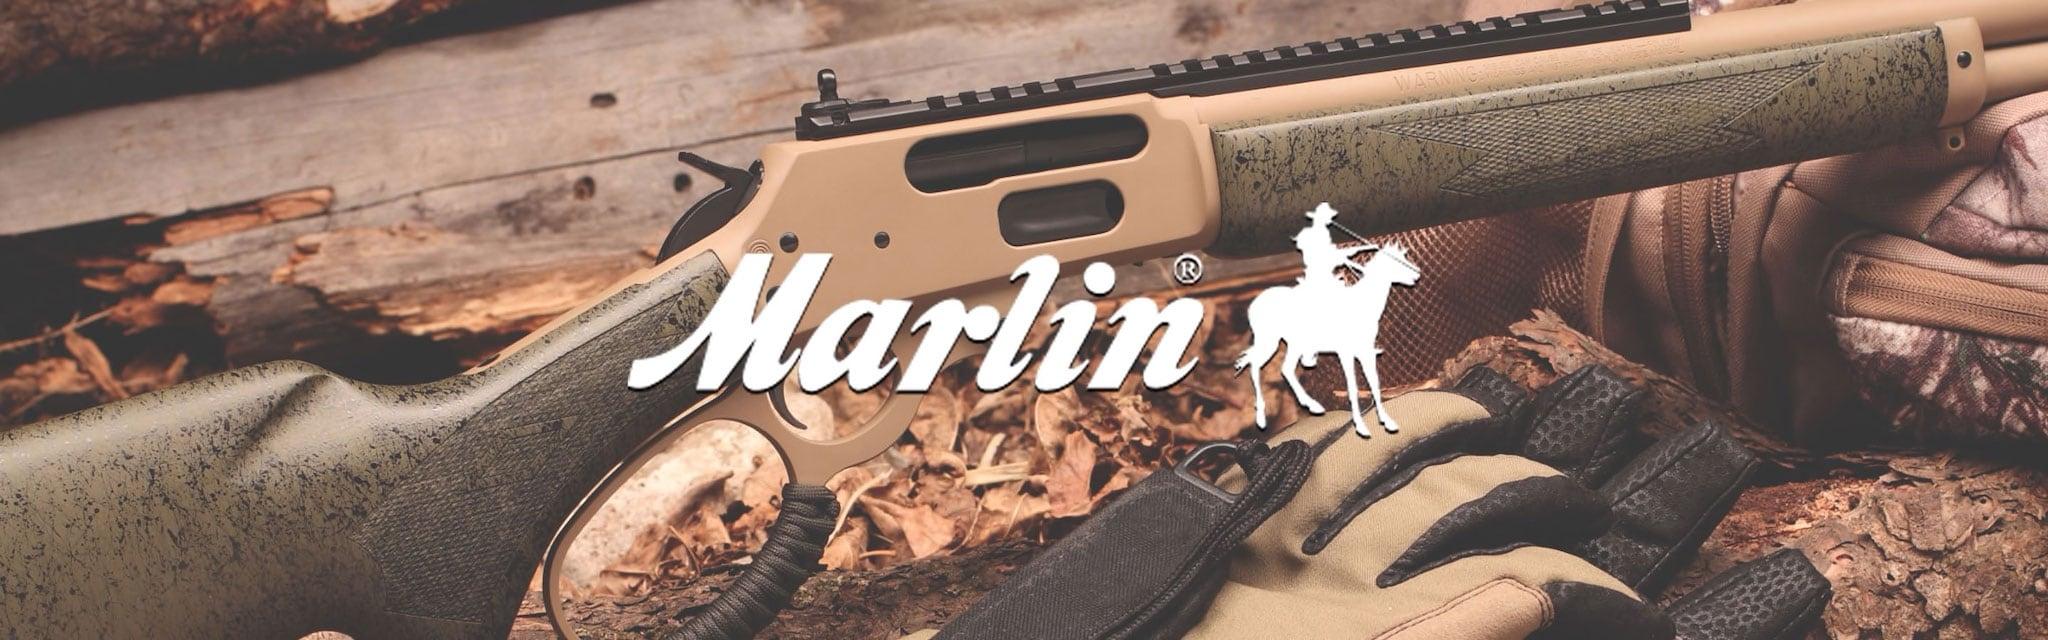 marlin brand banner